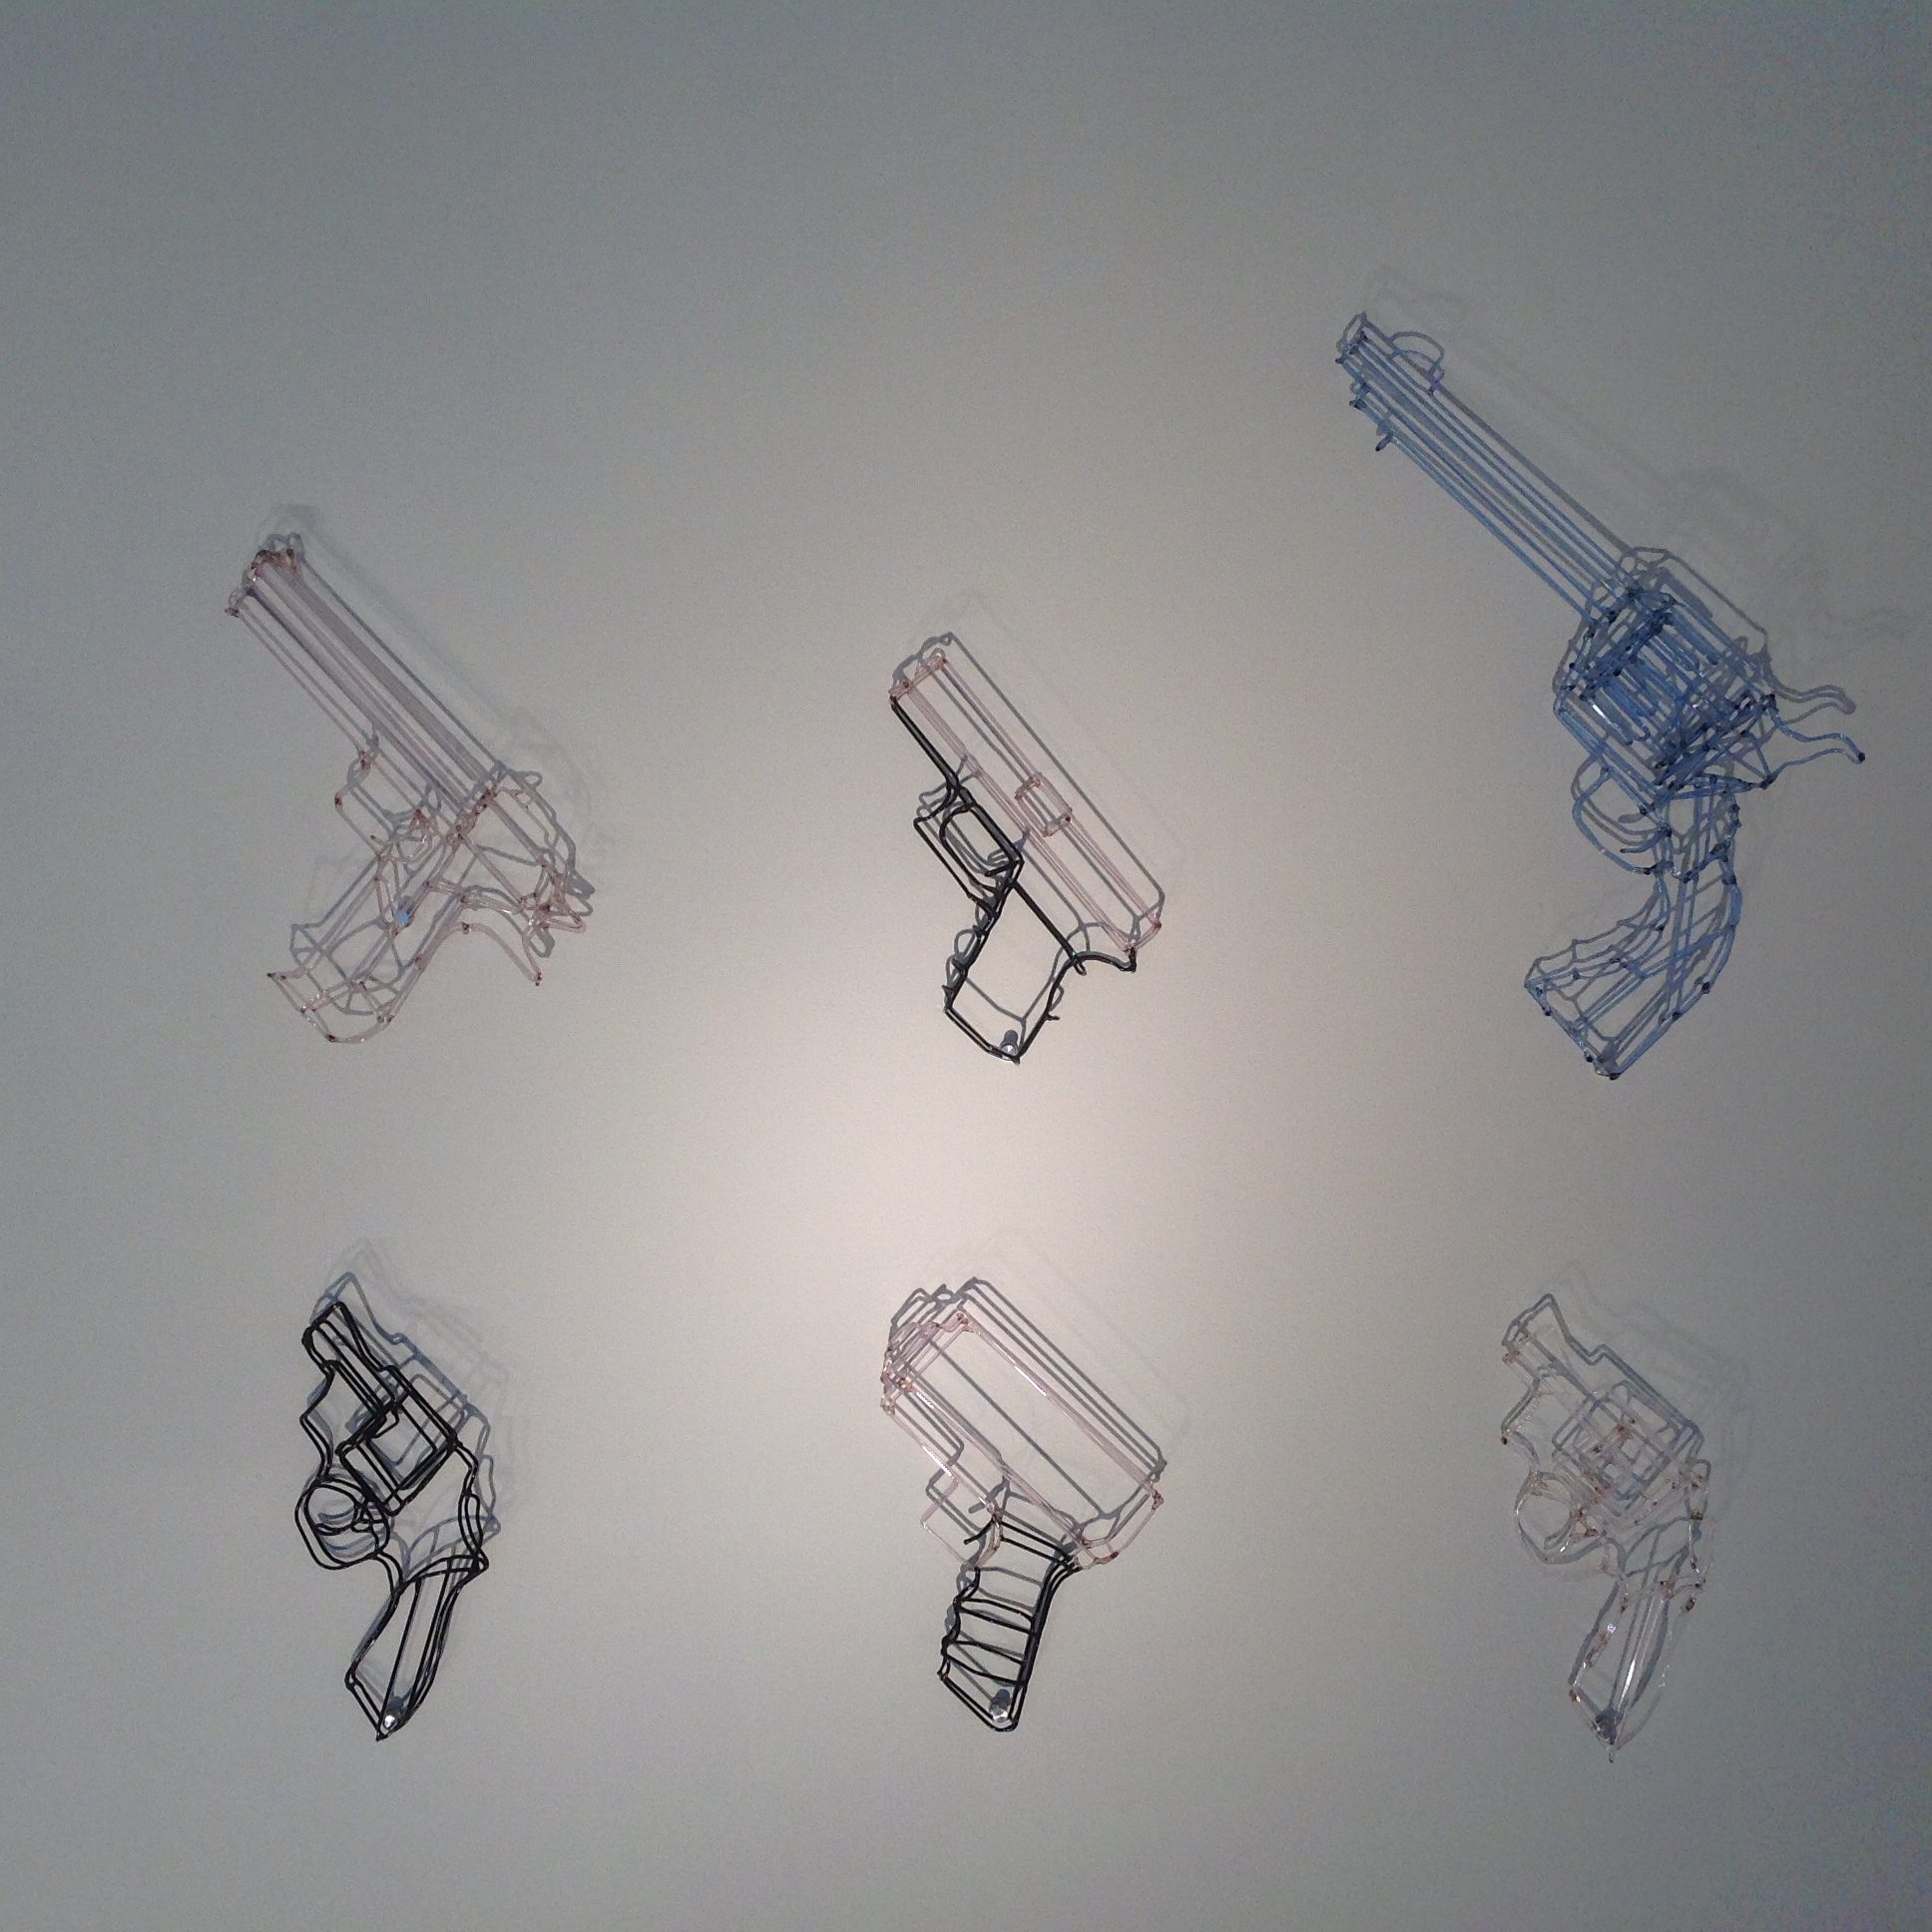 Aldin Huff's glass work